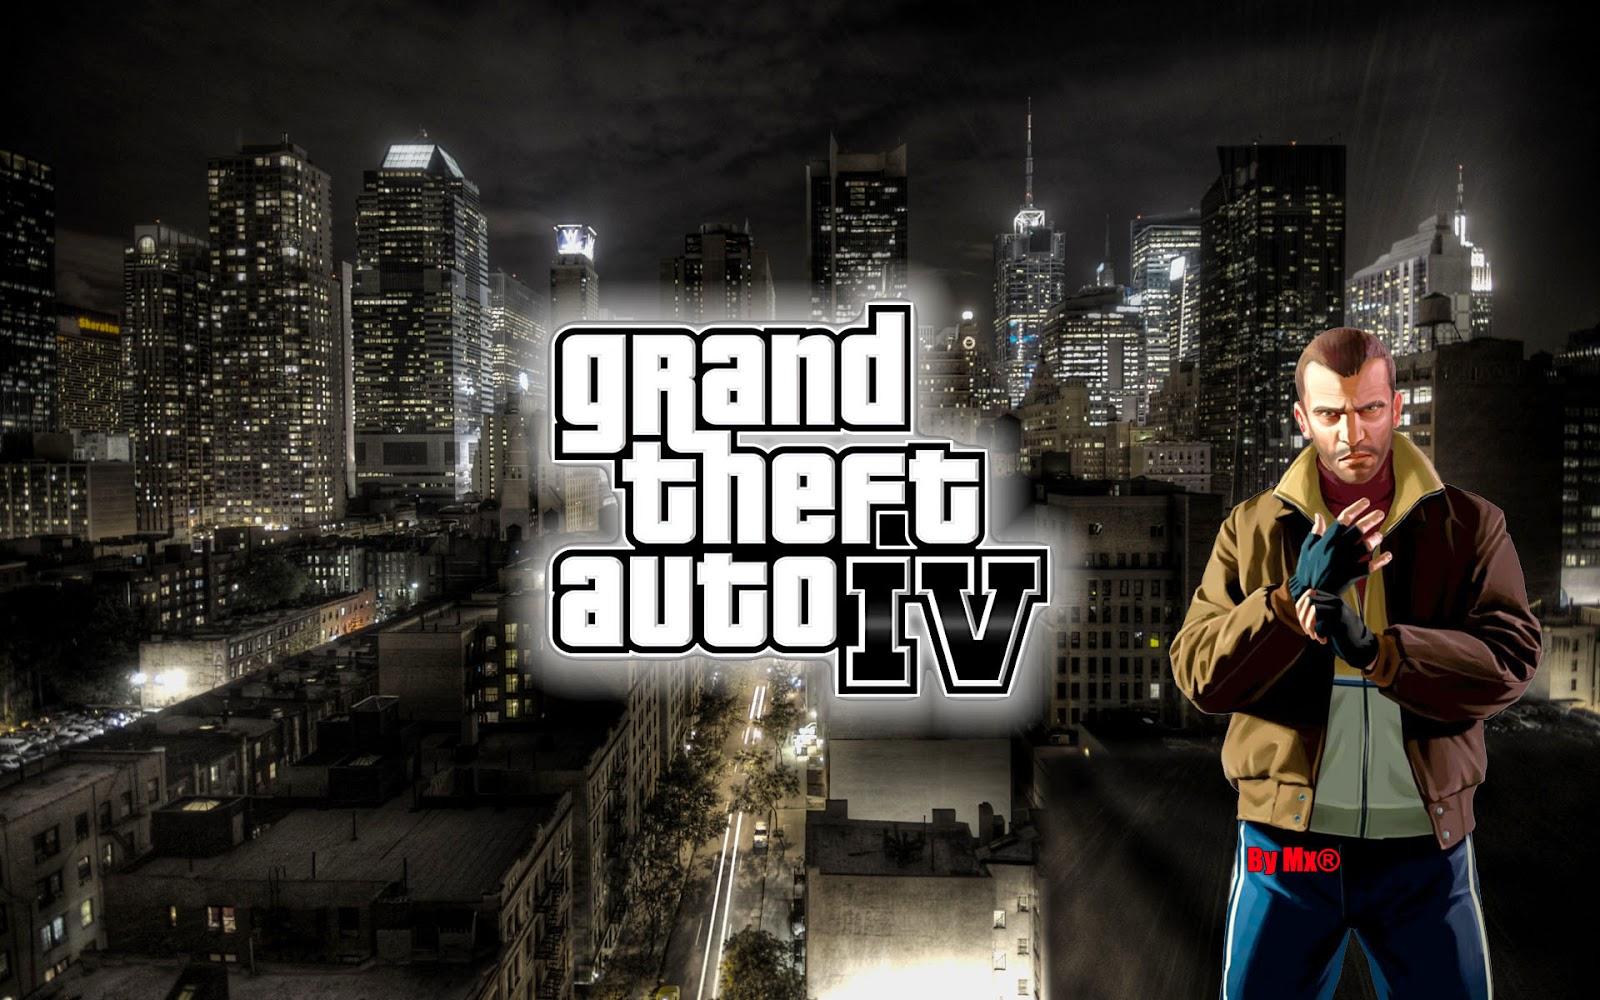 GTA IV Full Version Gratis Mang Kompi